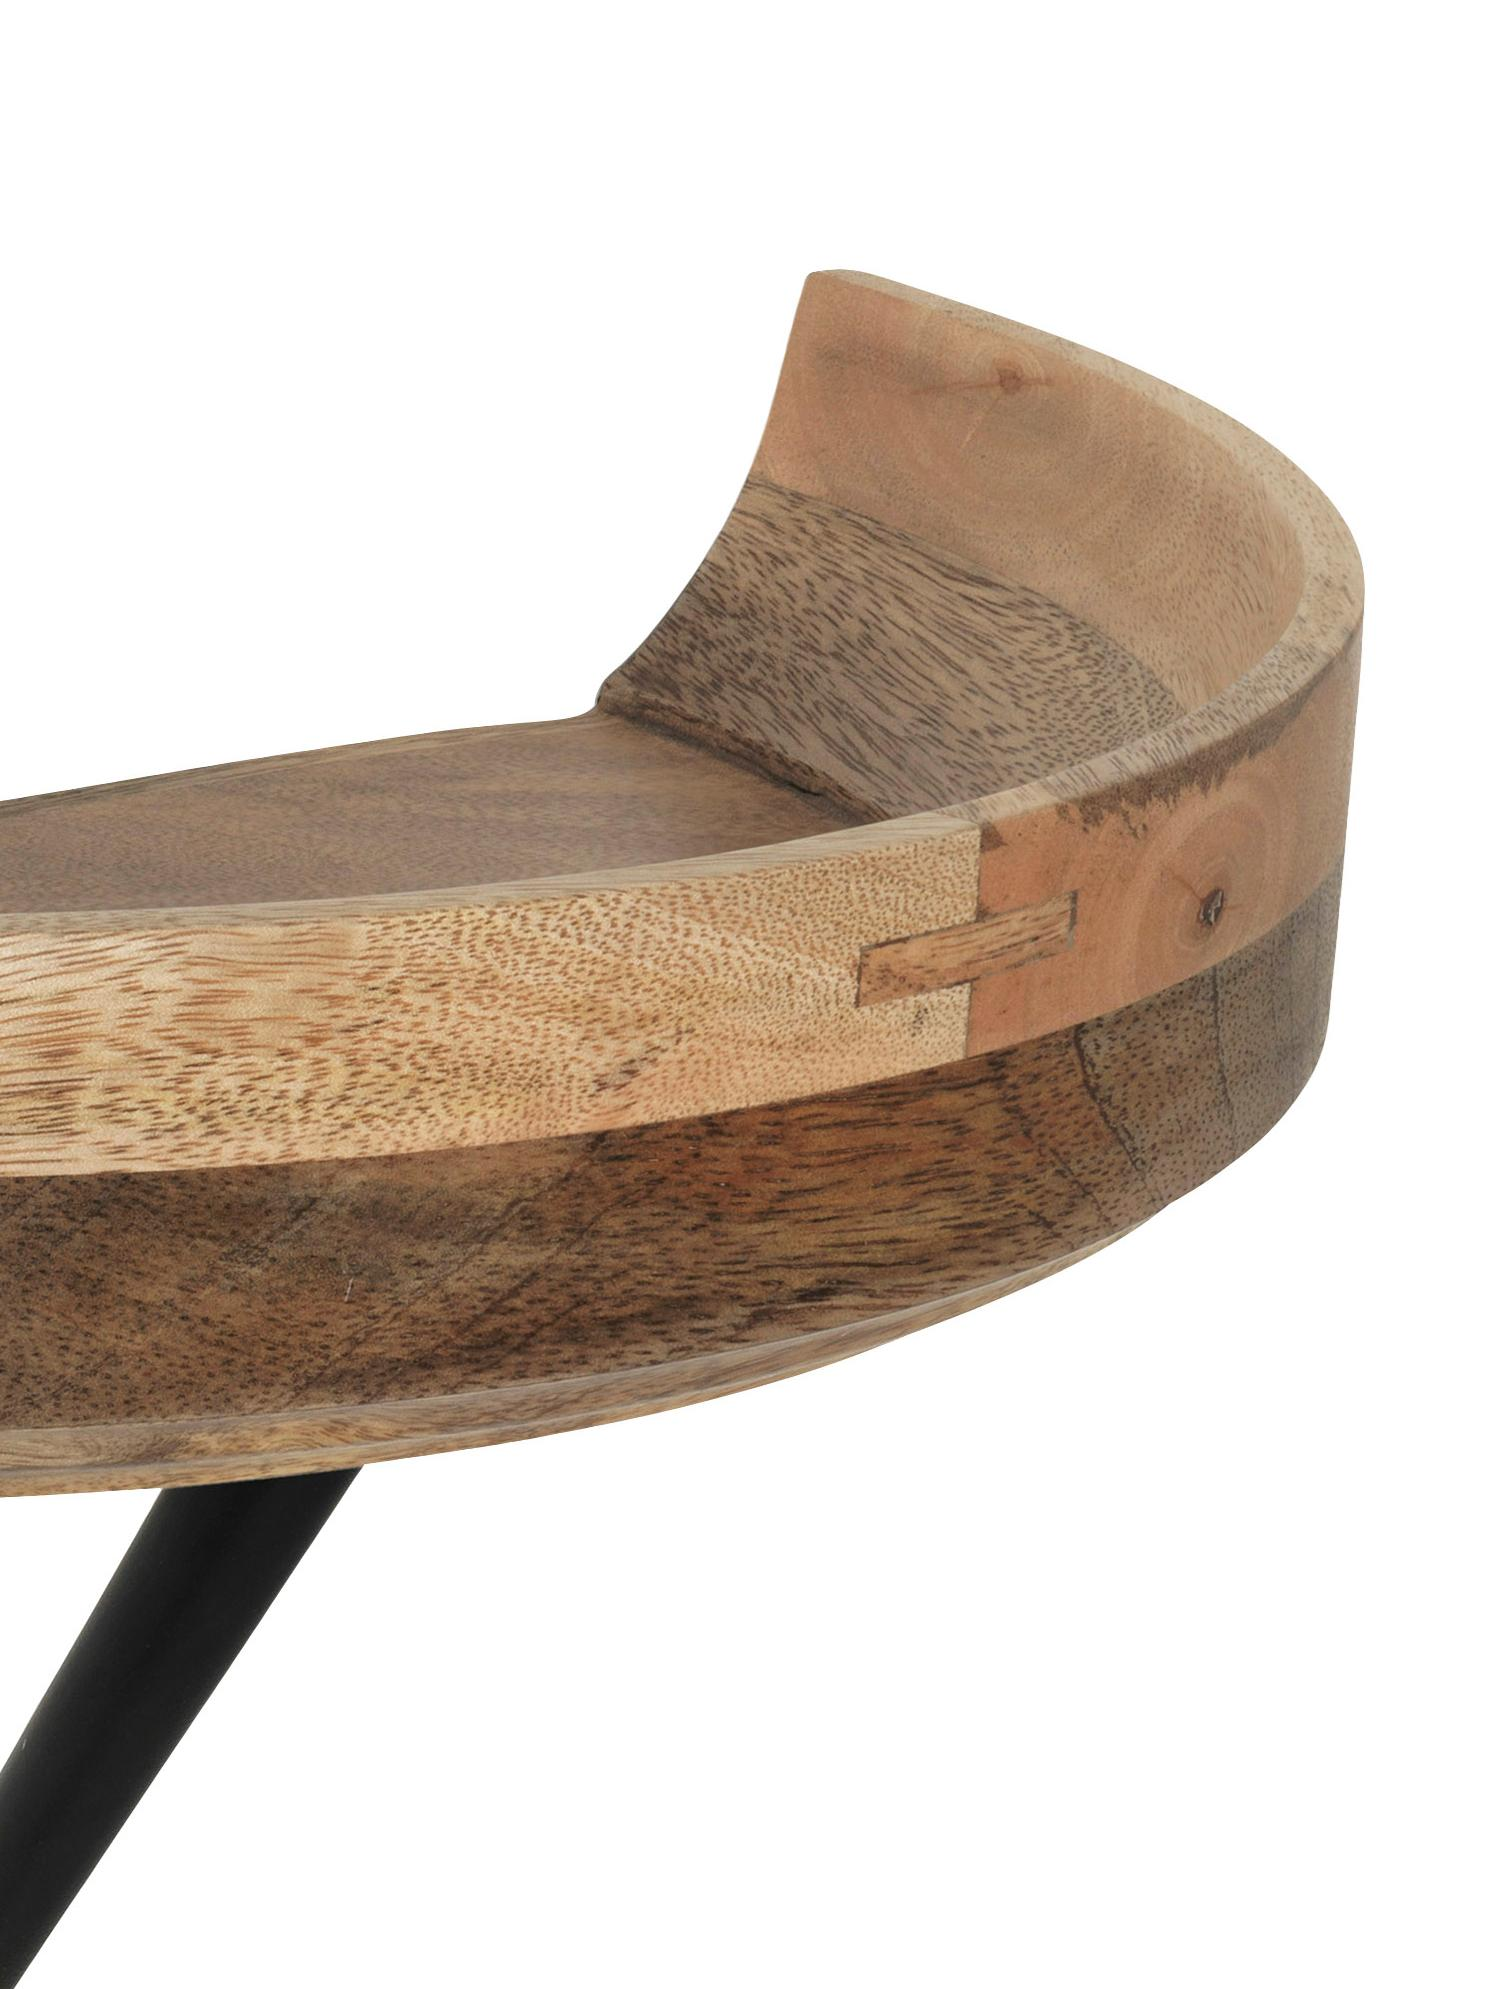 Design-Wandregal Bowl, Ablagefläche: Mangoholz, gebeizt, Strebe: Metall, pulverbeschichtet, Ablagefläche: MangoGestell: Schwarz, B 40 x T 27 cm